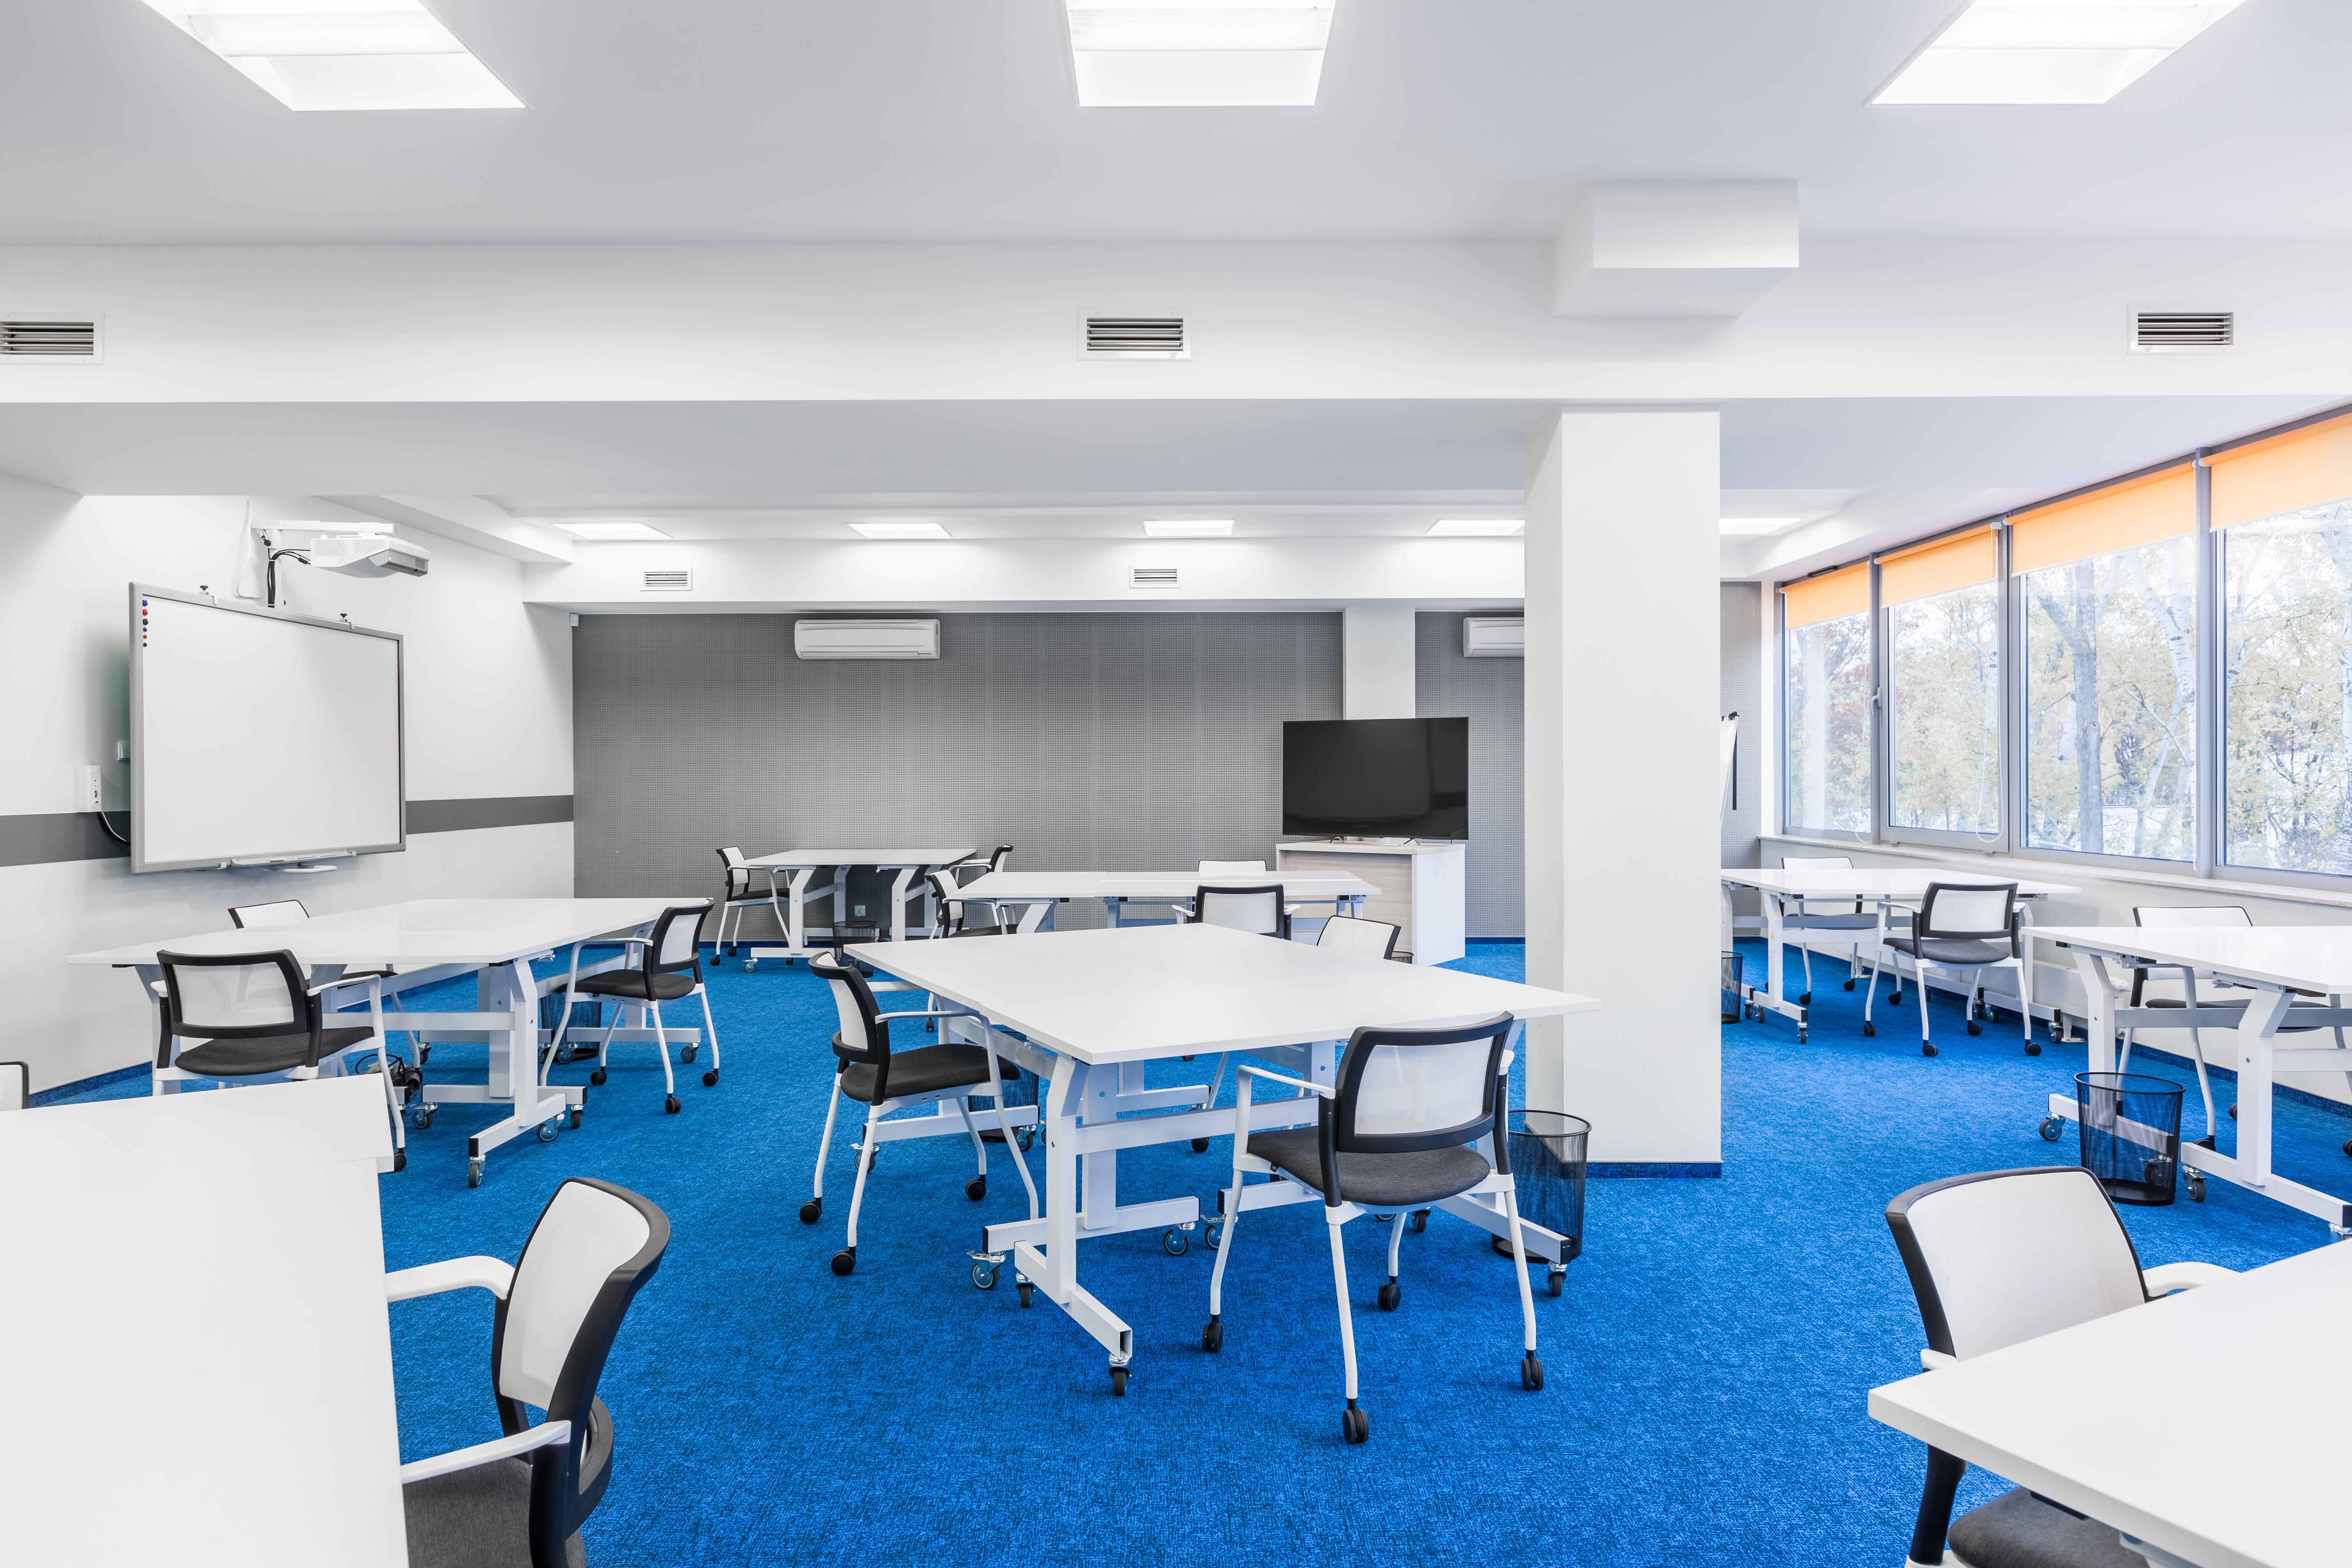 LED panelen klaslokaal